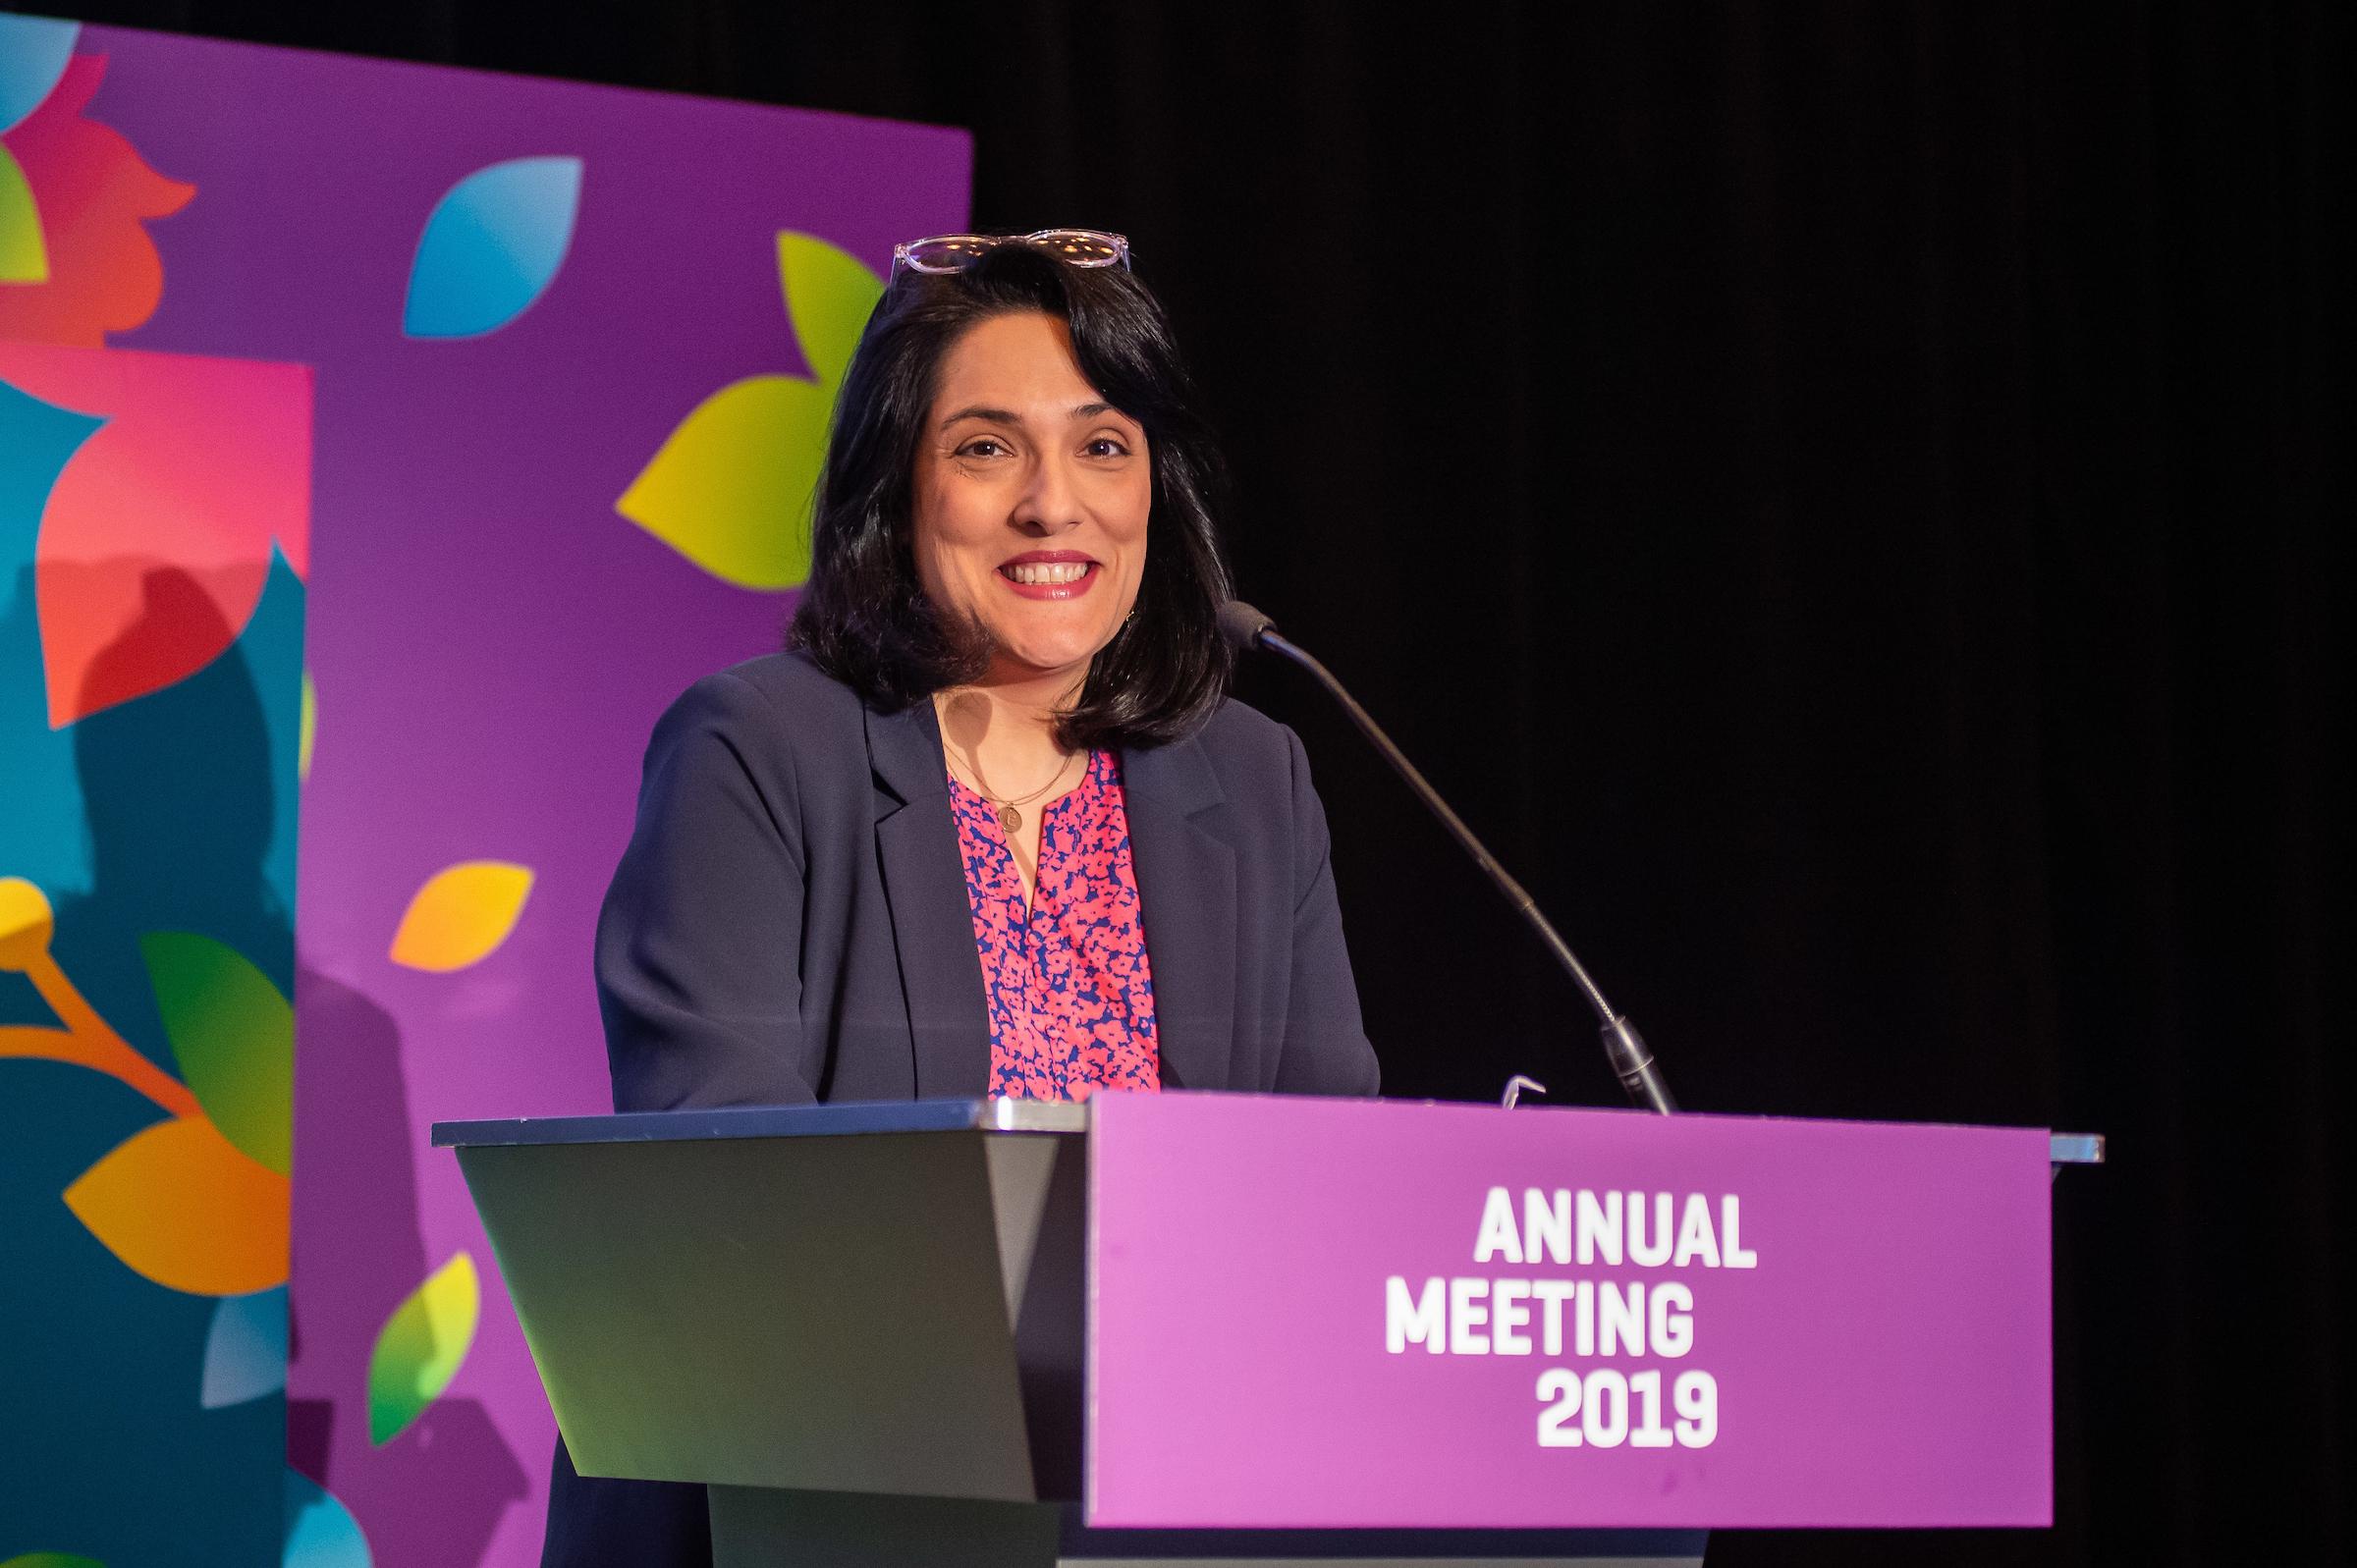 USP Executive Director Jennifer Falk gives the 2019 Annual Report